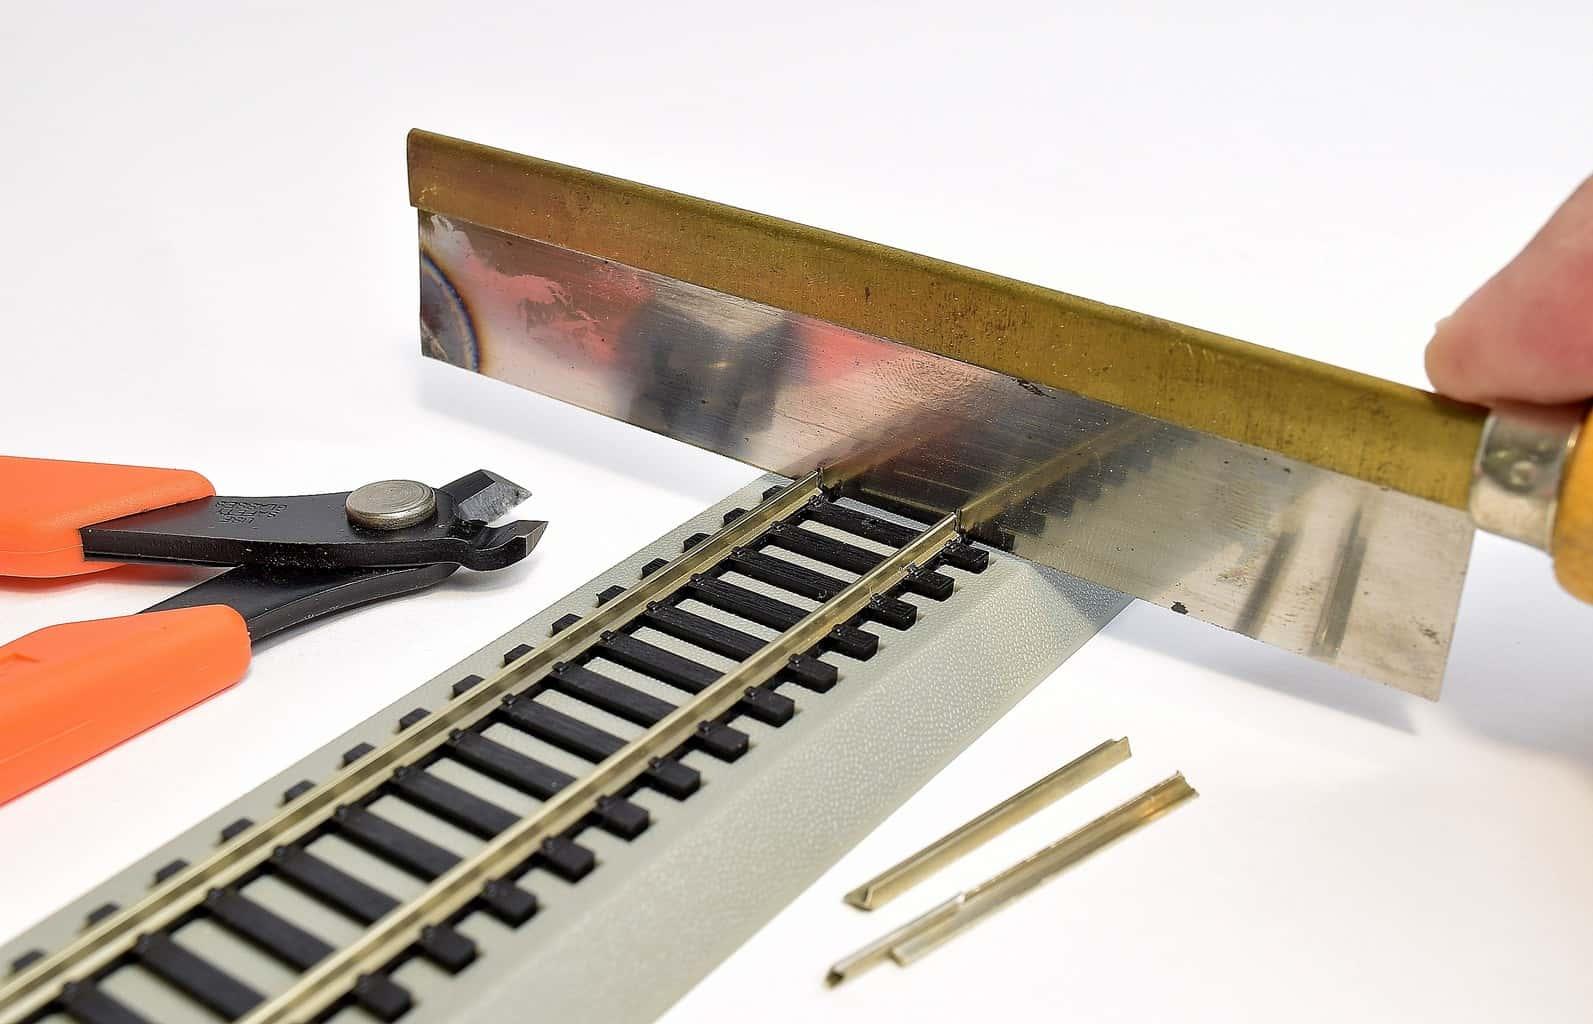 Model Railroad Track: A Beginners Guide to Rail Cutting